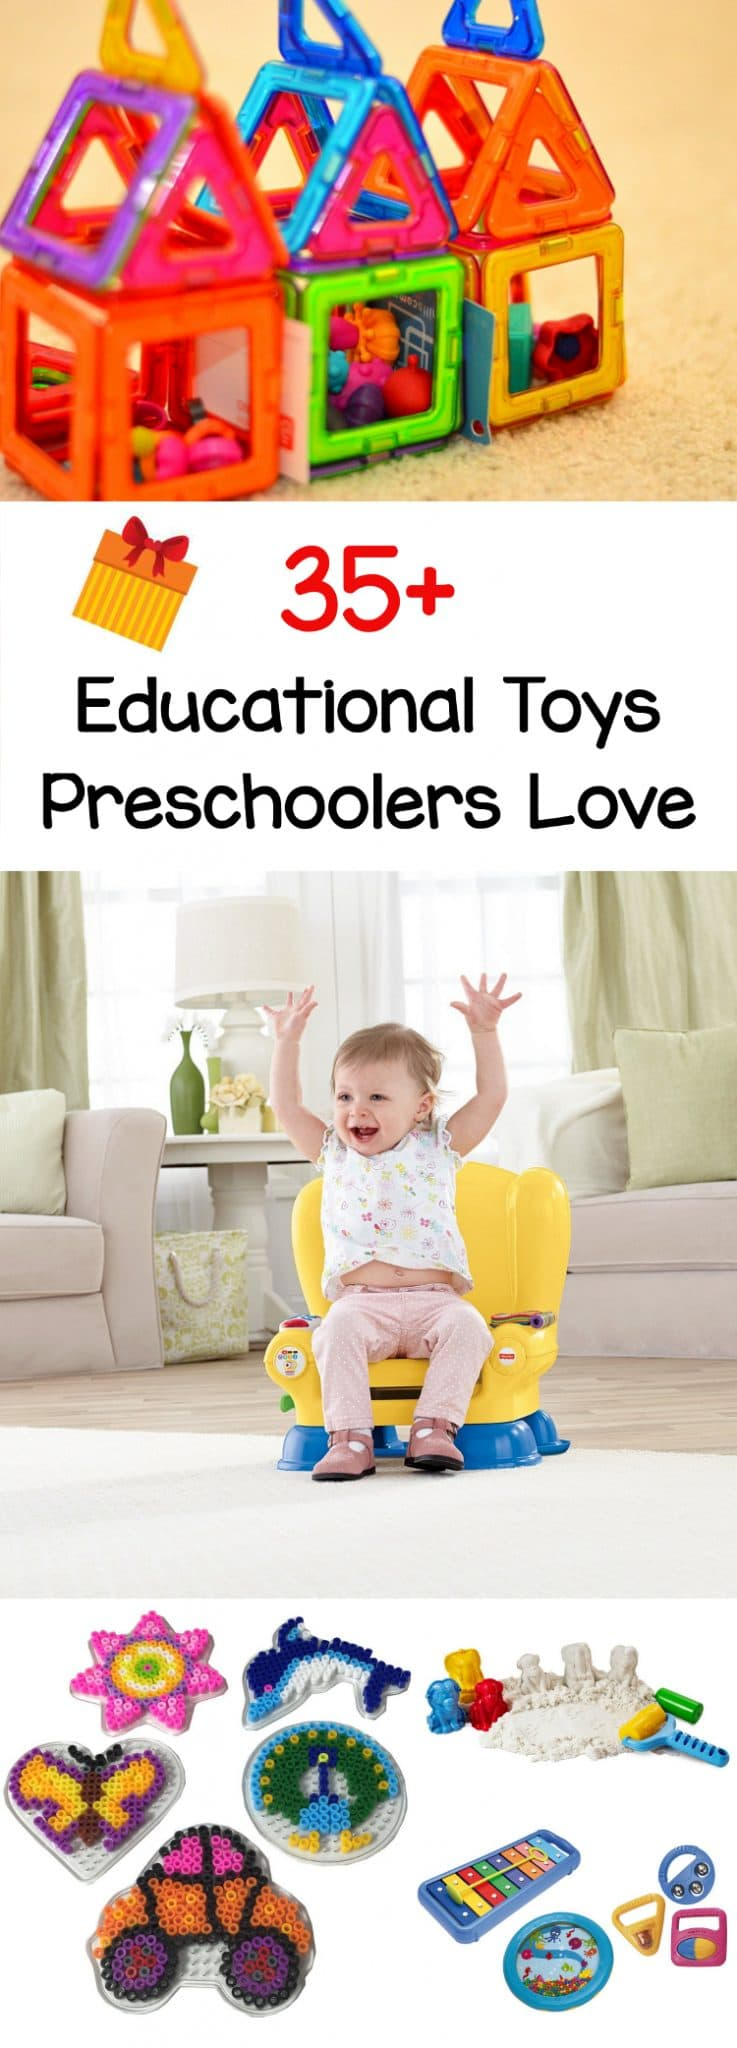 educational toys preschoolers love